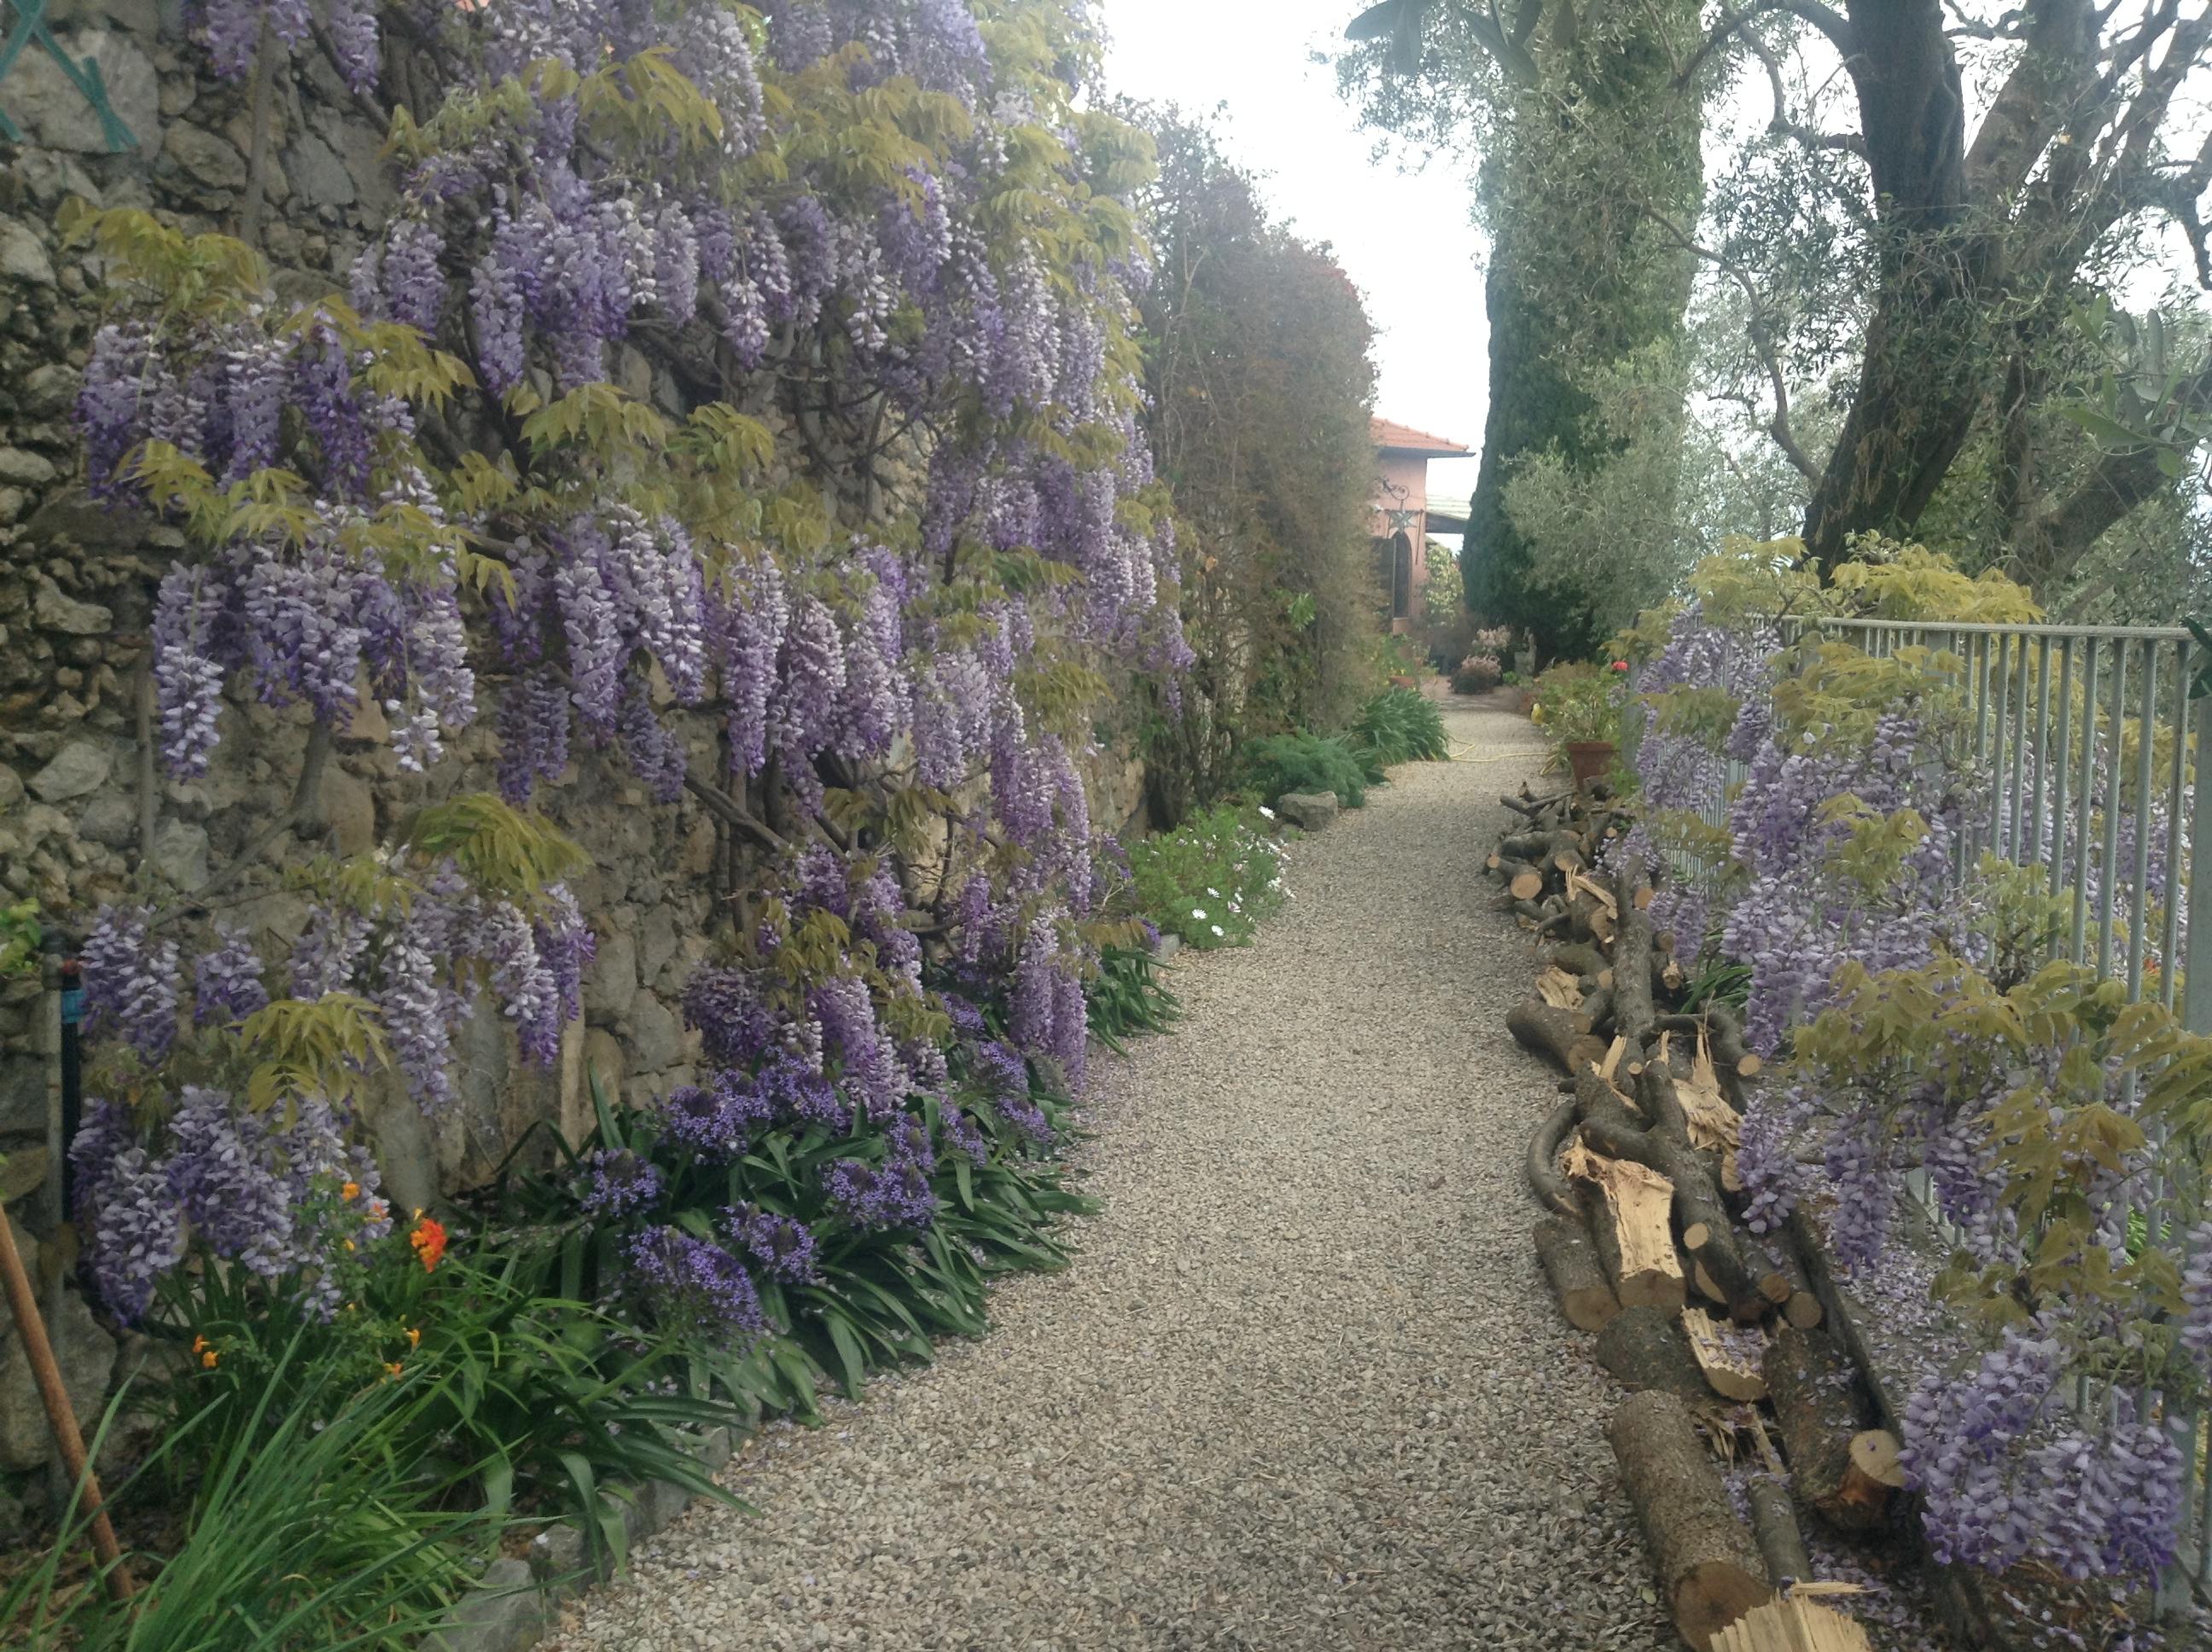 Hanbury wisteria